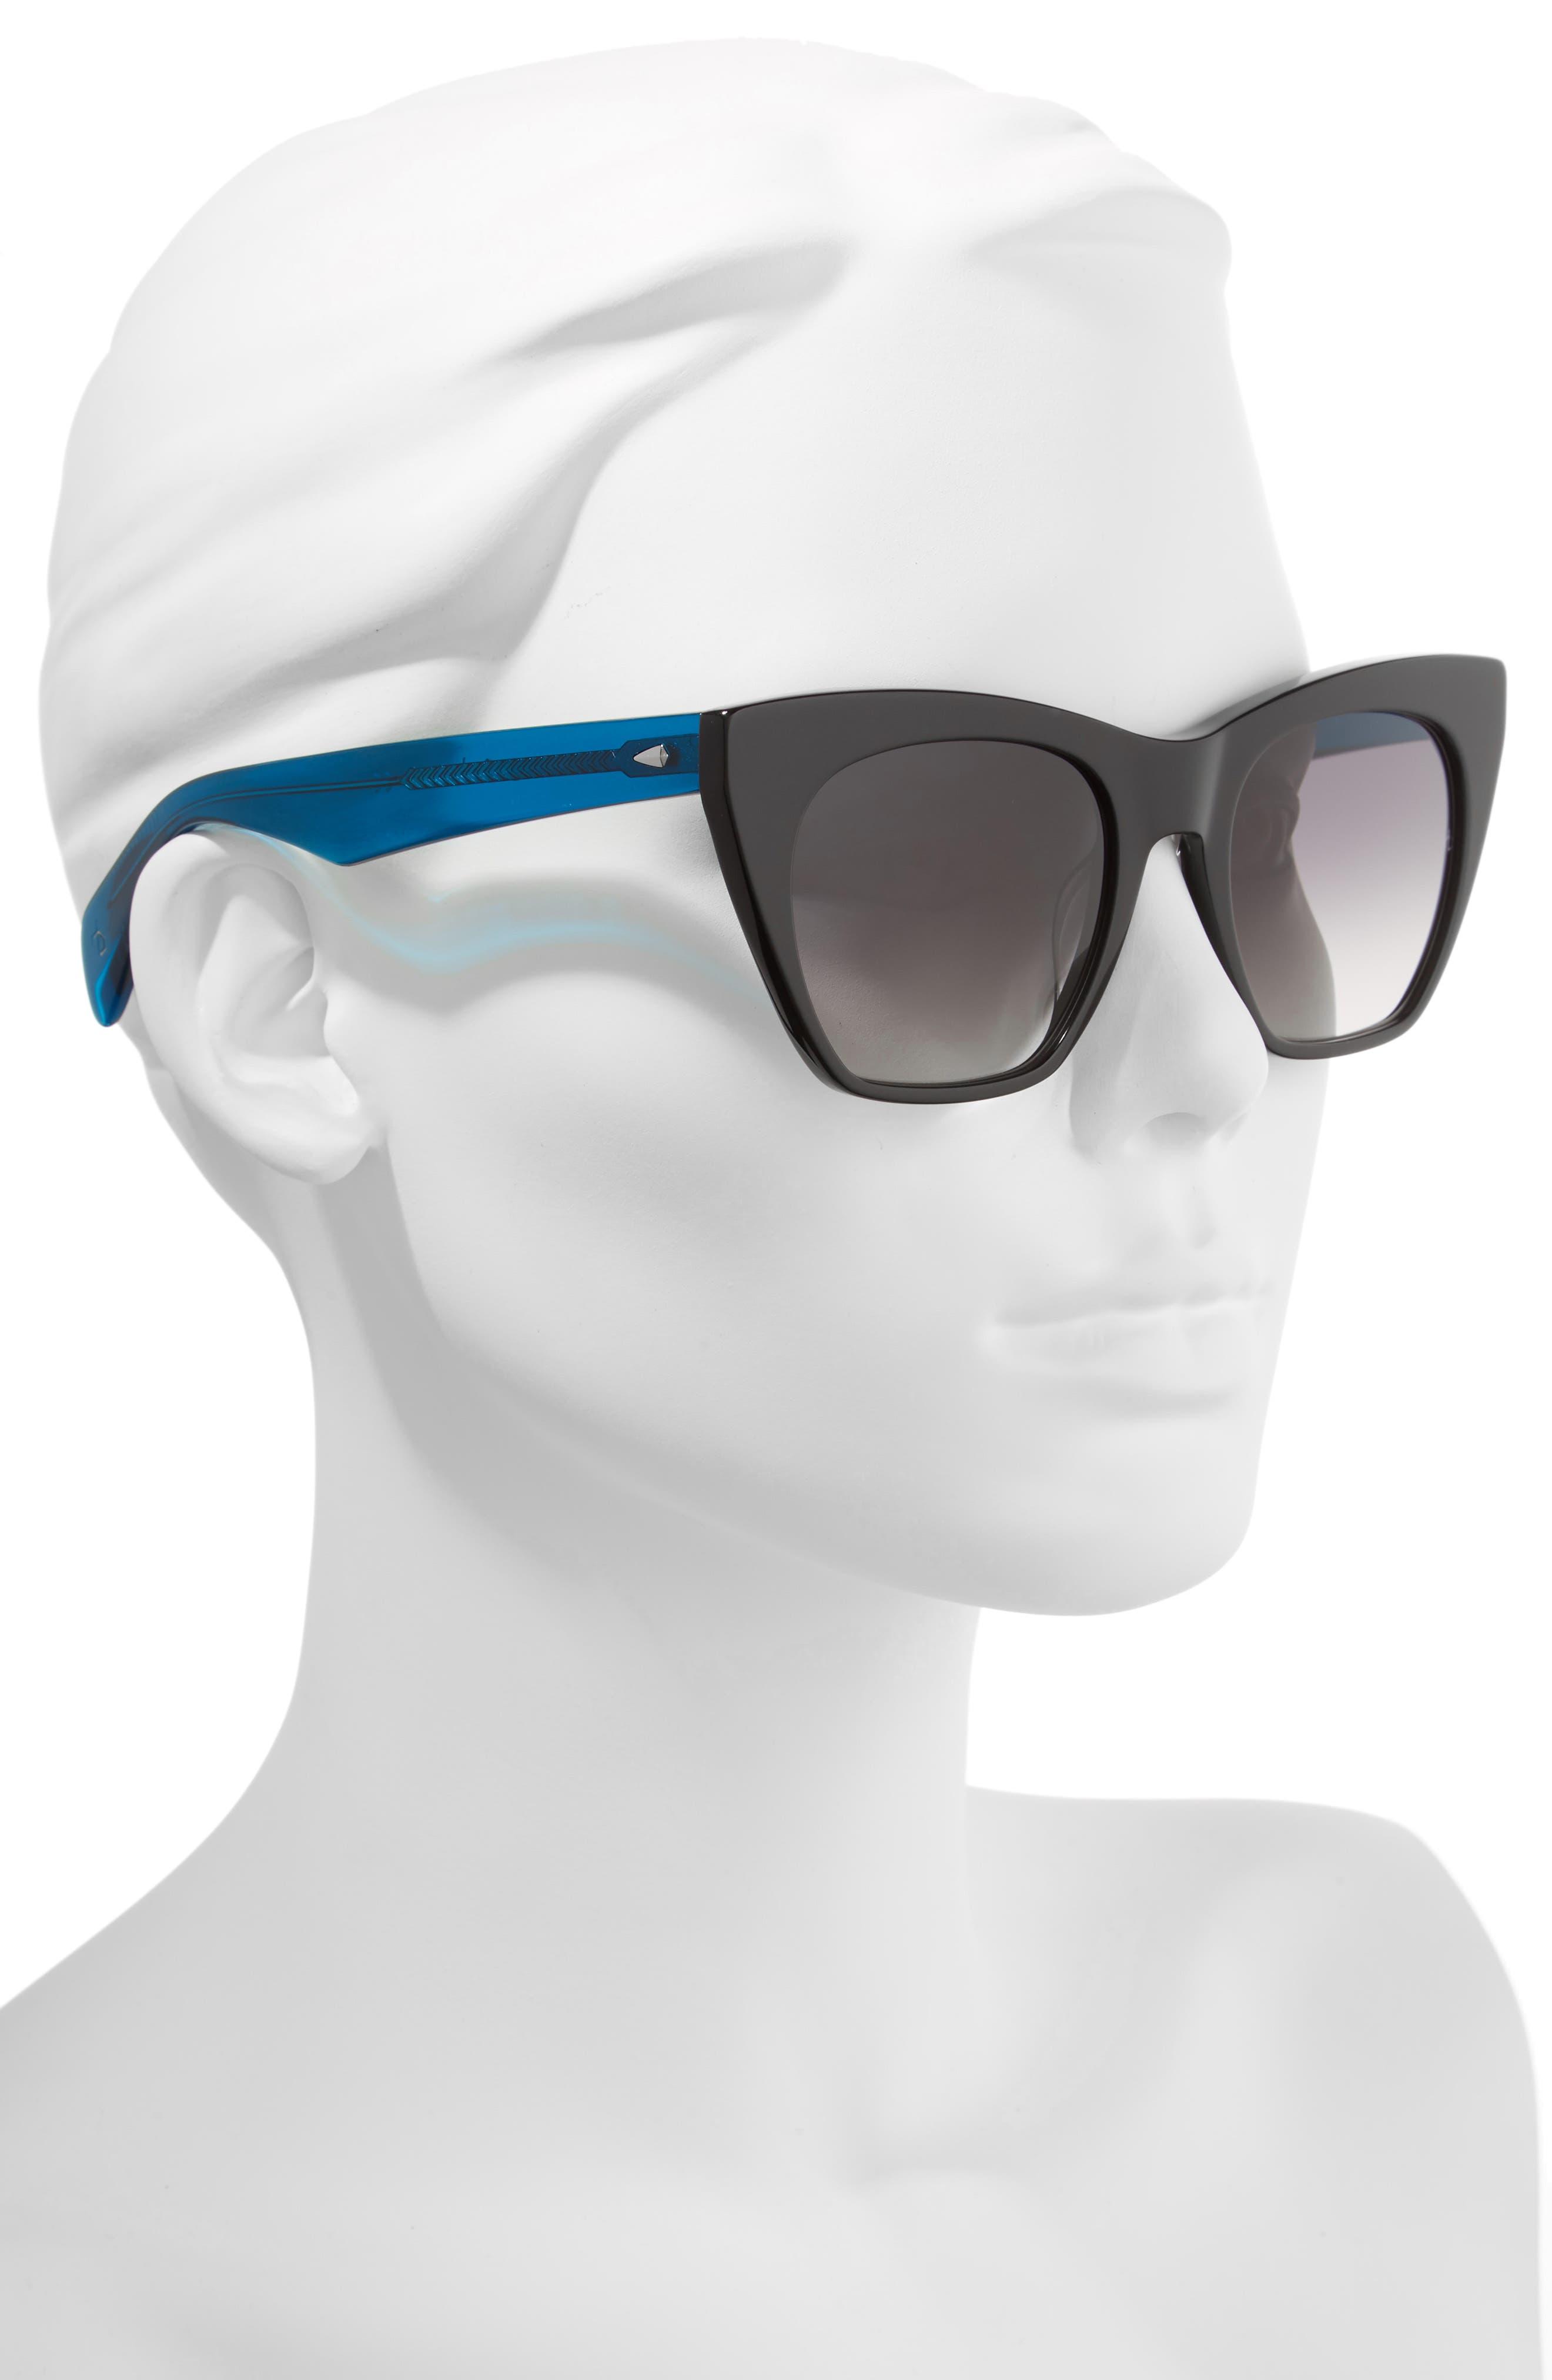 52mm Cat Eye Sunglasses,                             Alternate thumbnail 2, color,                             BLACK/ BLUE